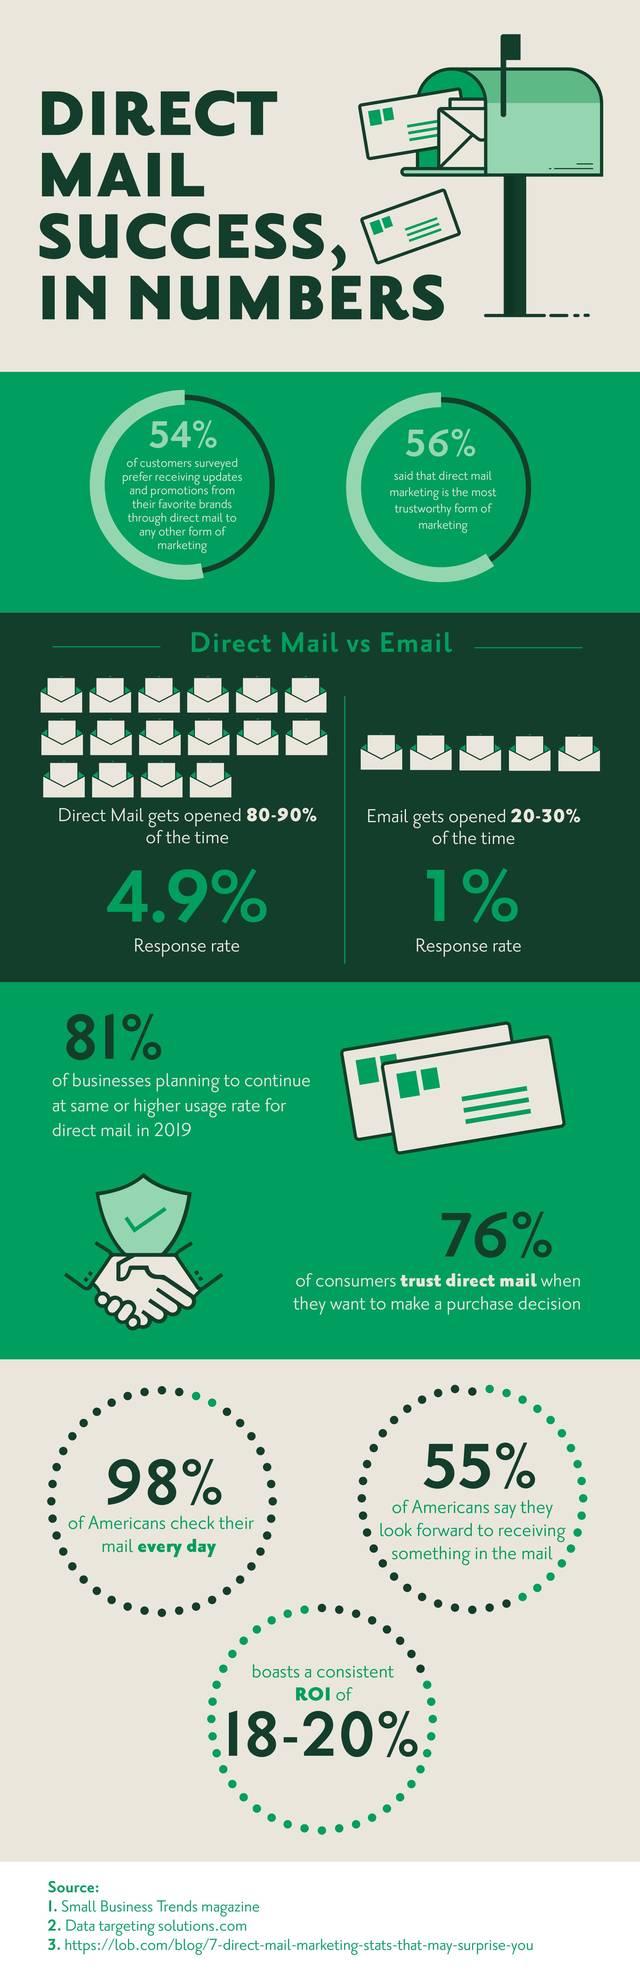 Direct mail statistics infographic